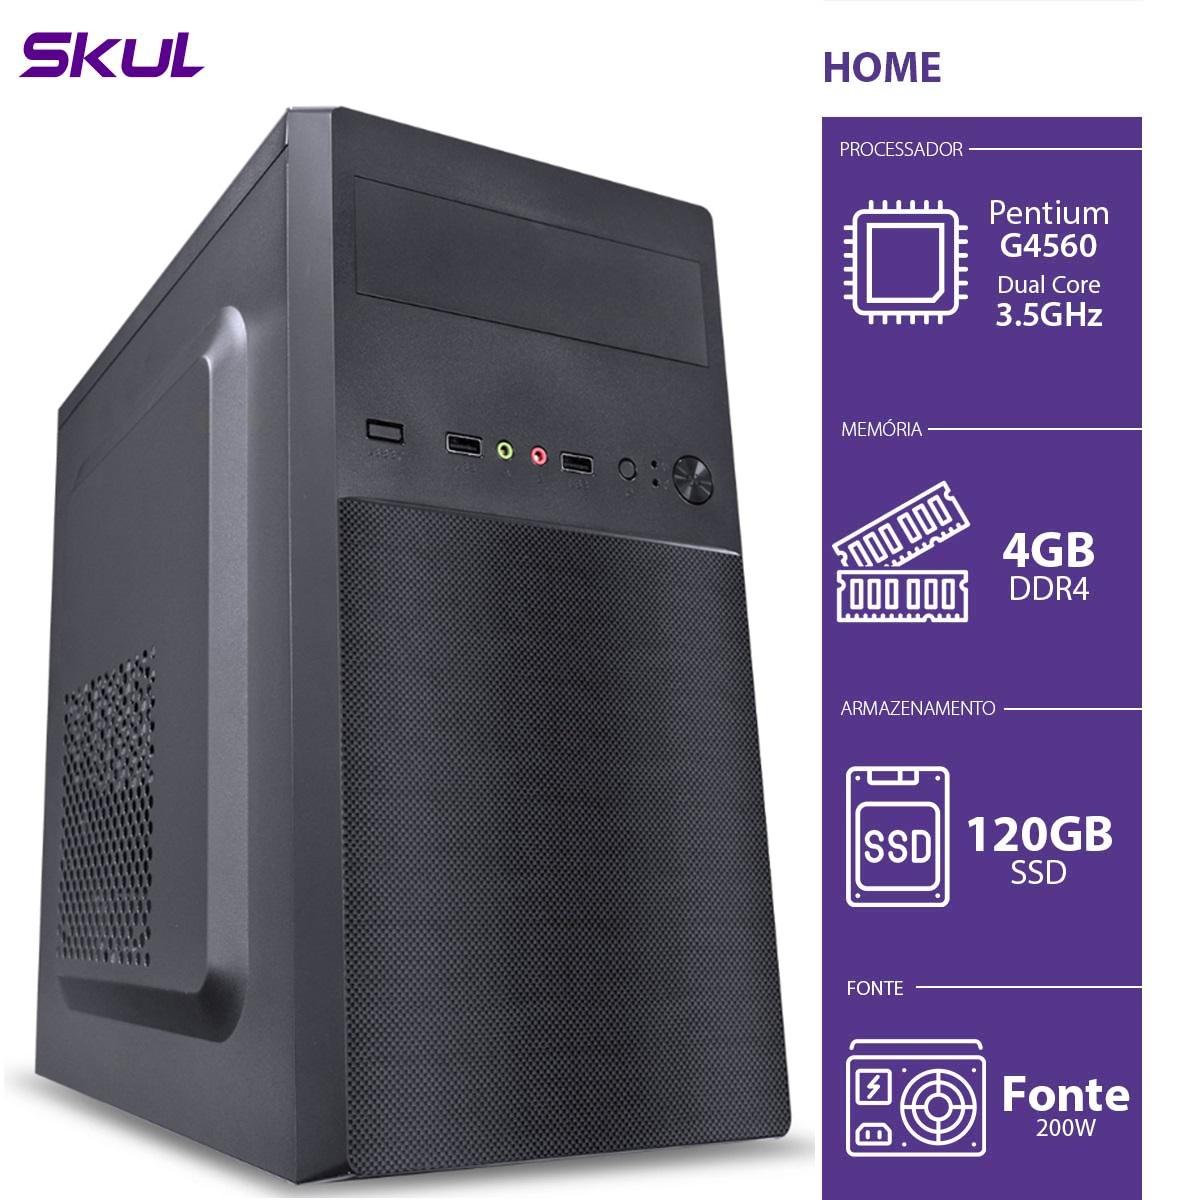 COMPUTADOR HOME H200 - PENTIUM DUAL CORE G4560 3.5GHZ 4GB DDR4 SSD 120GB HDMI/VGA FONTE 200W